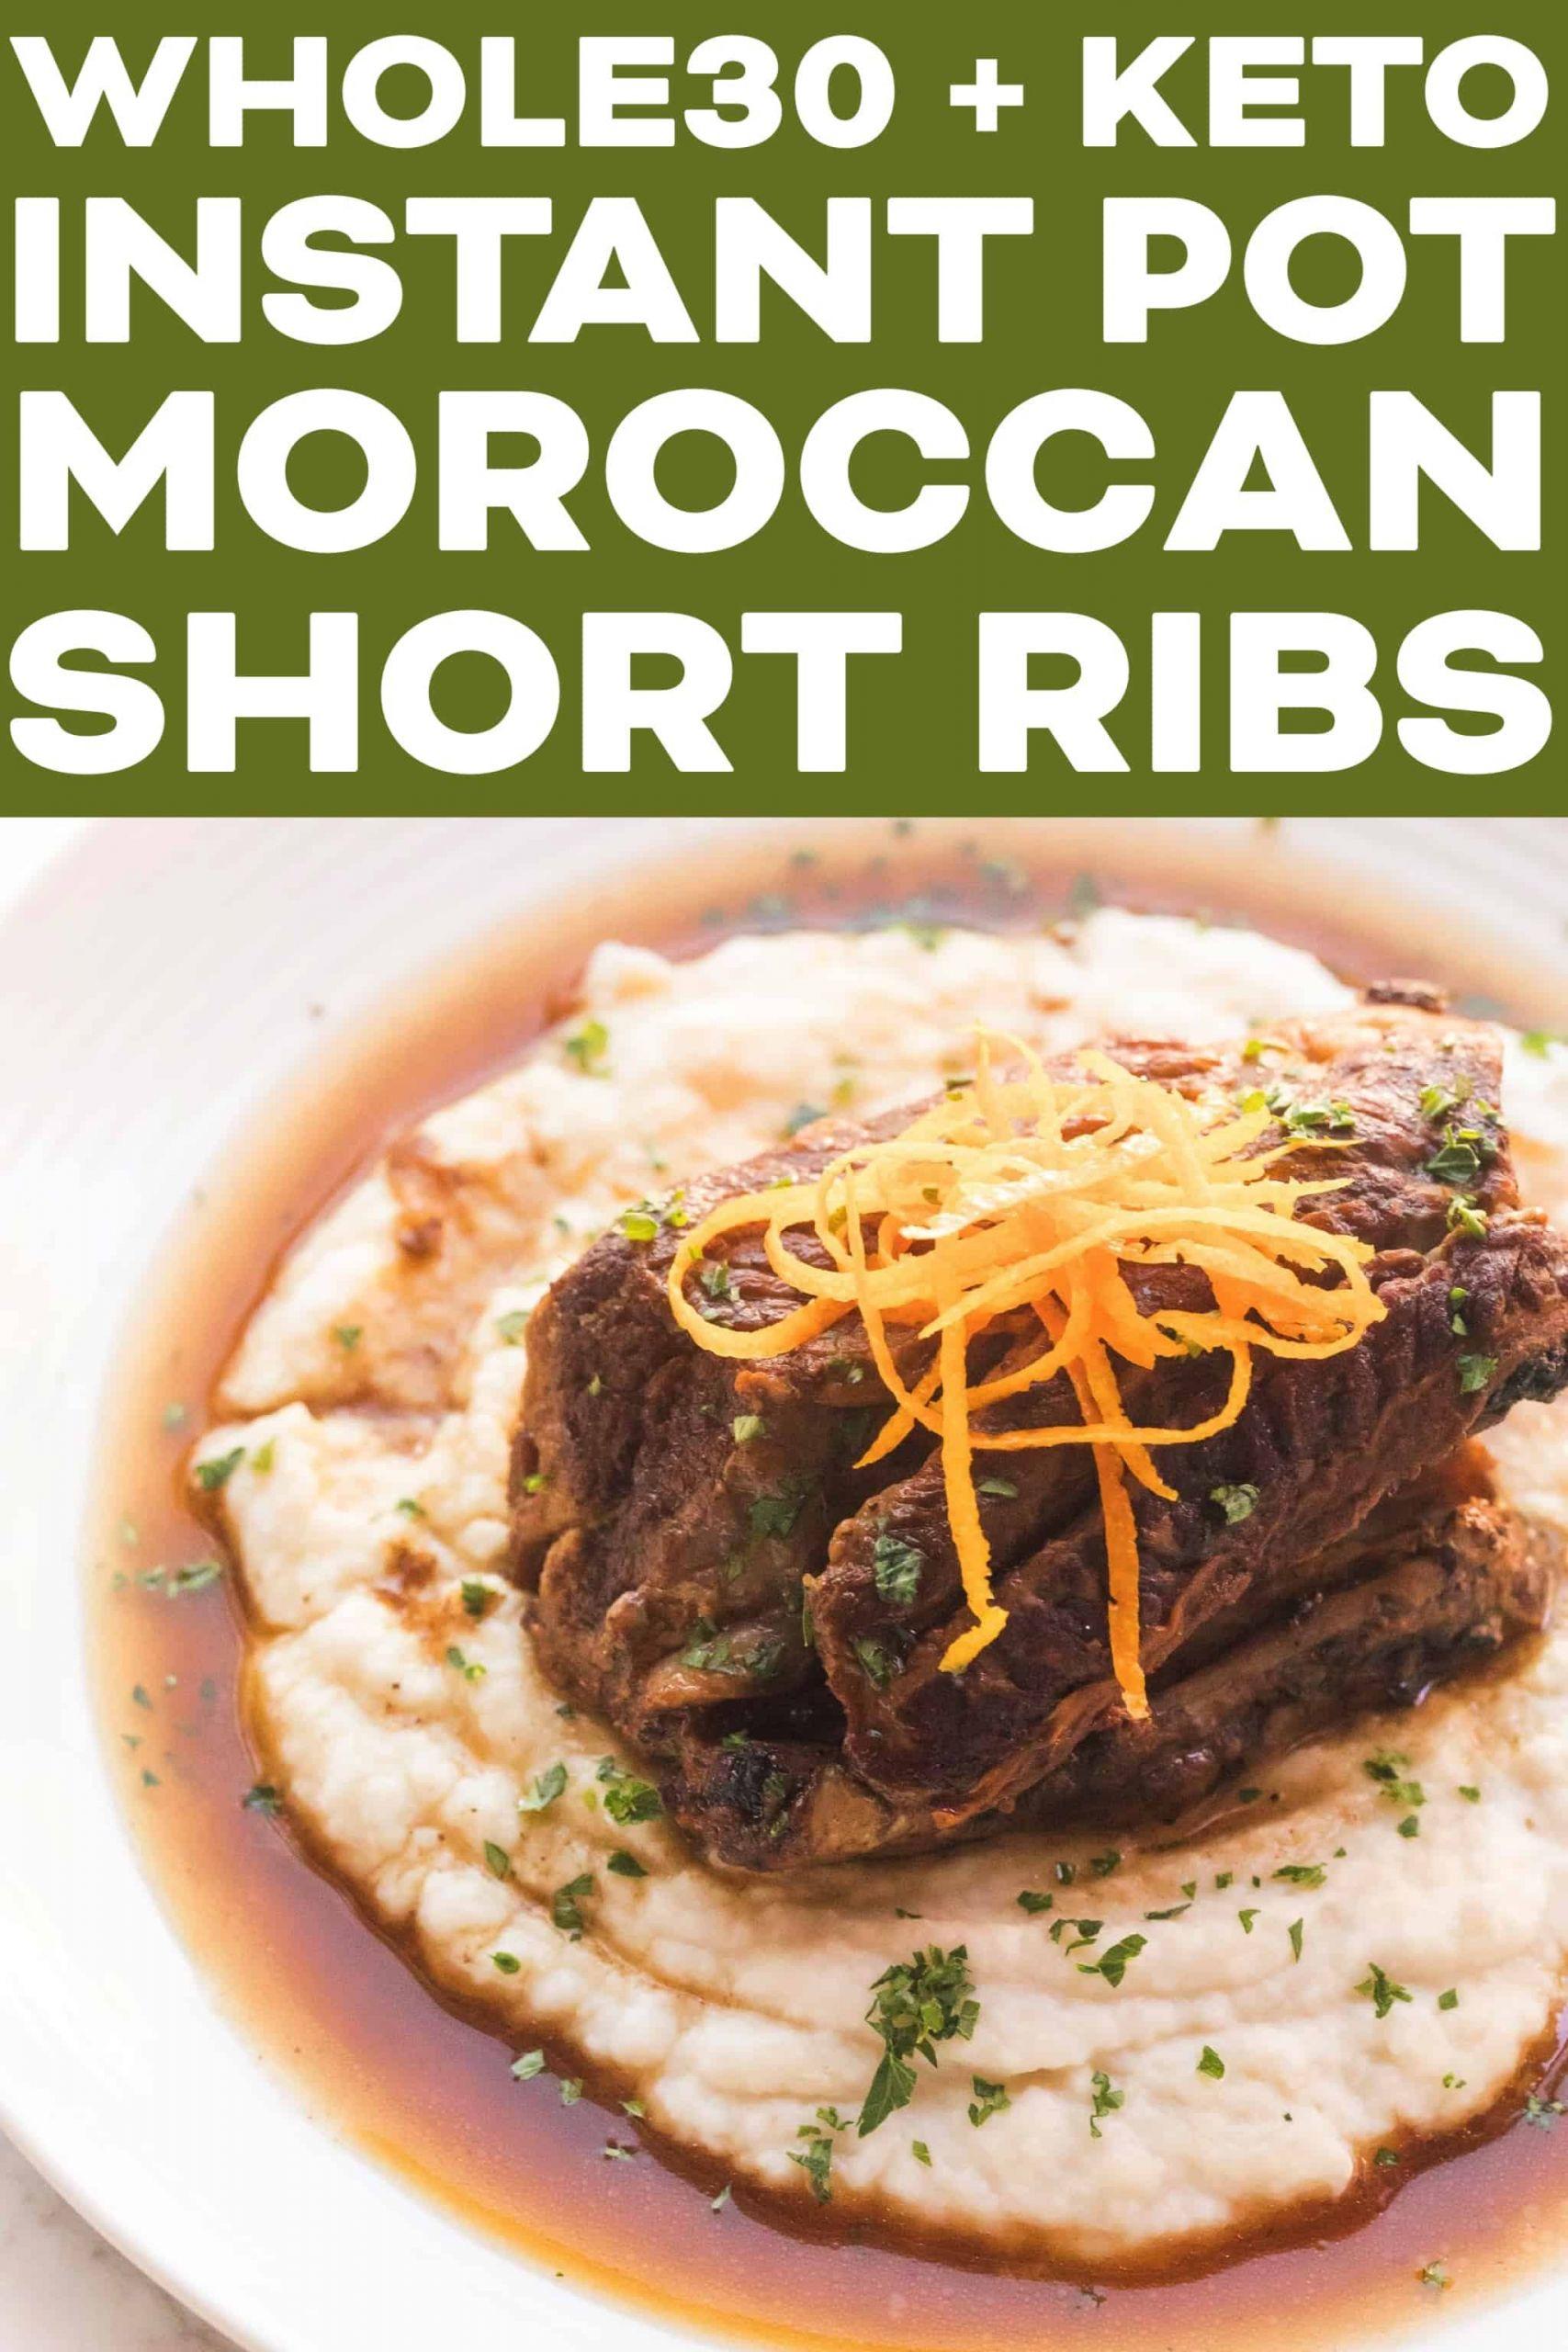 Short Ribs Instant Pot Keto  Whole30 Keto Instant Pot Moroccan Short Ribs Tastes Lovely